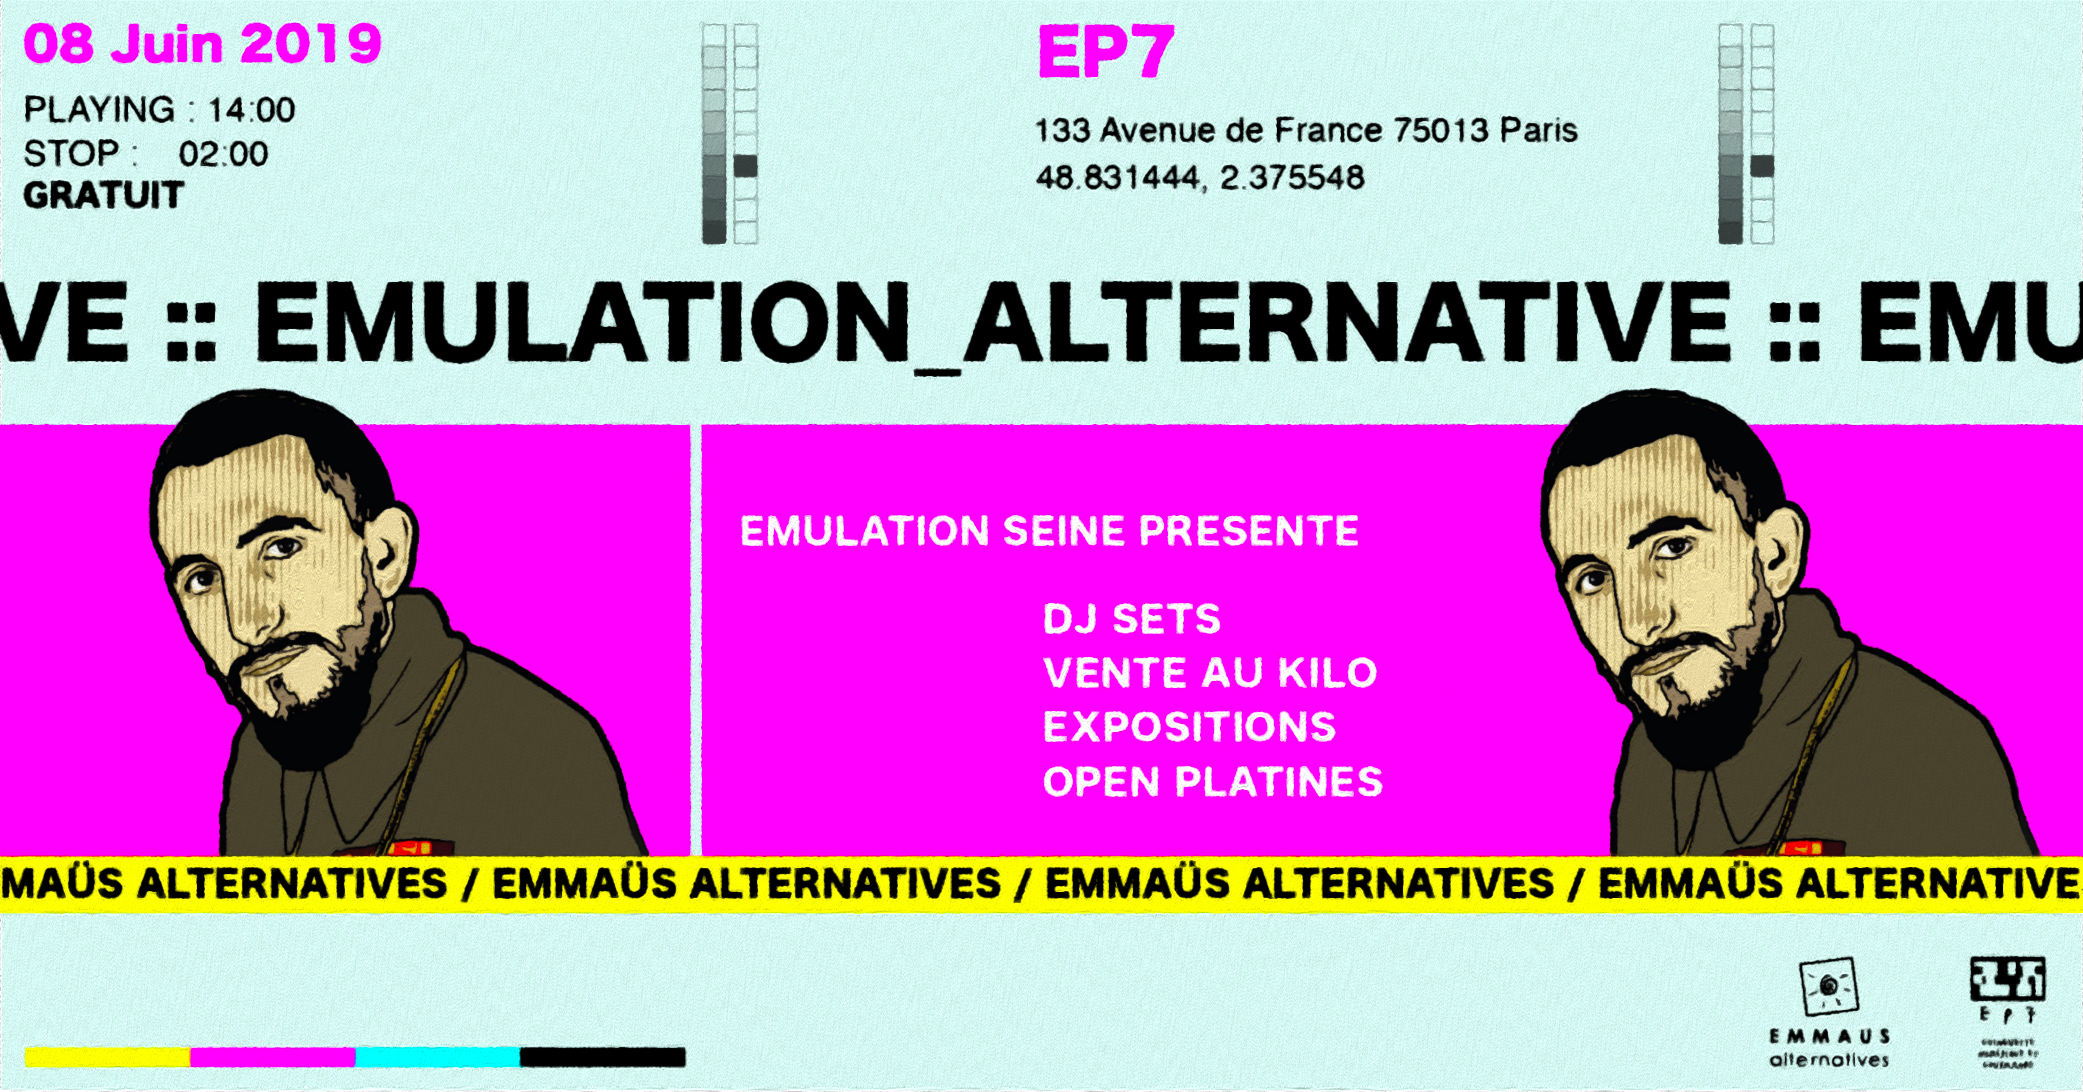 Emulation Seine x Emmaüs alternative: Emulation Alternative